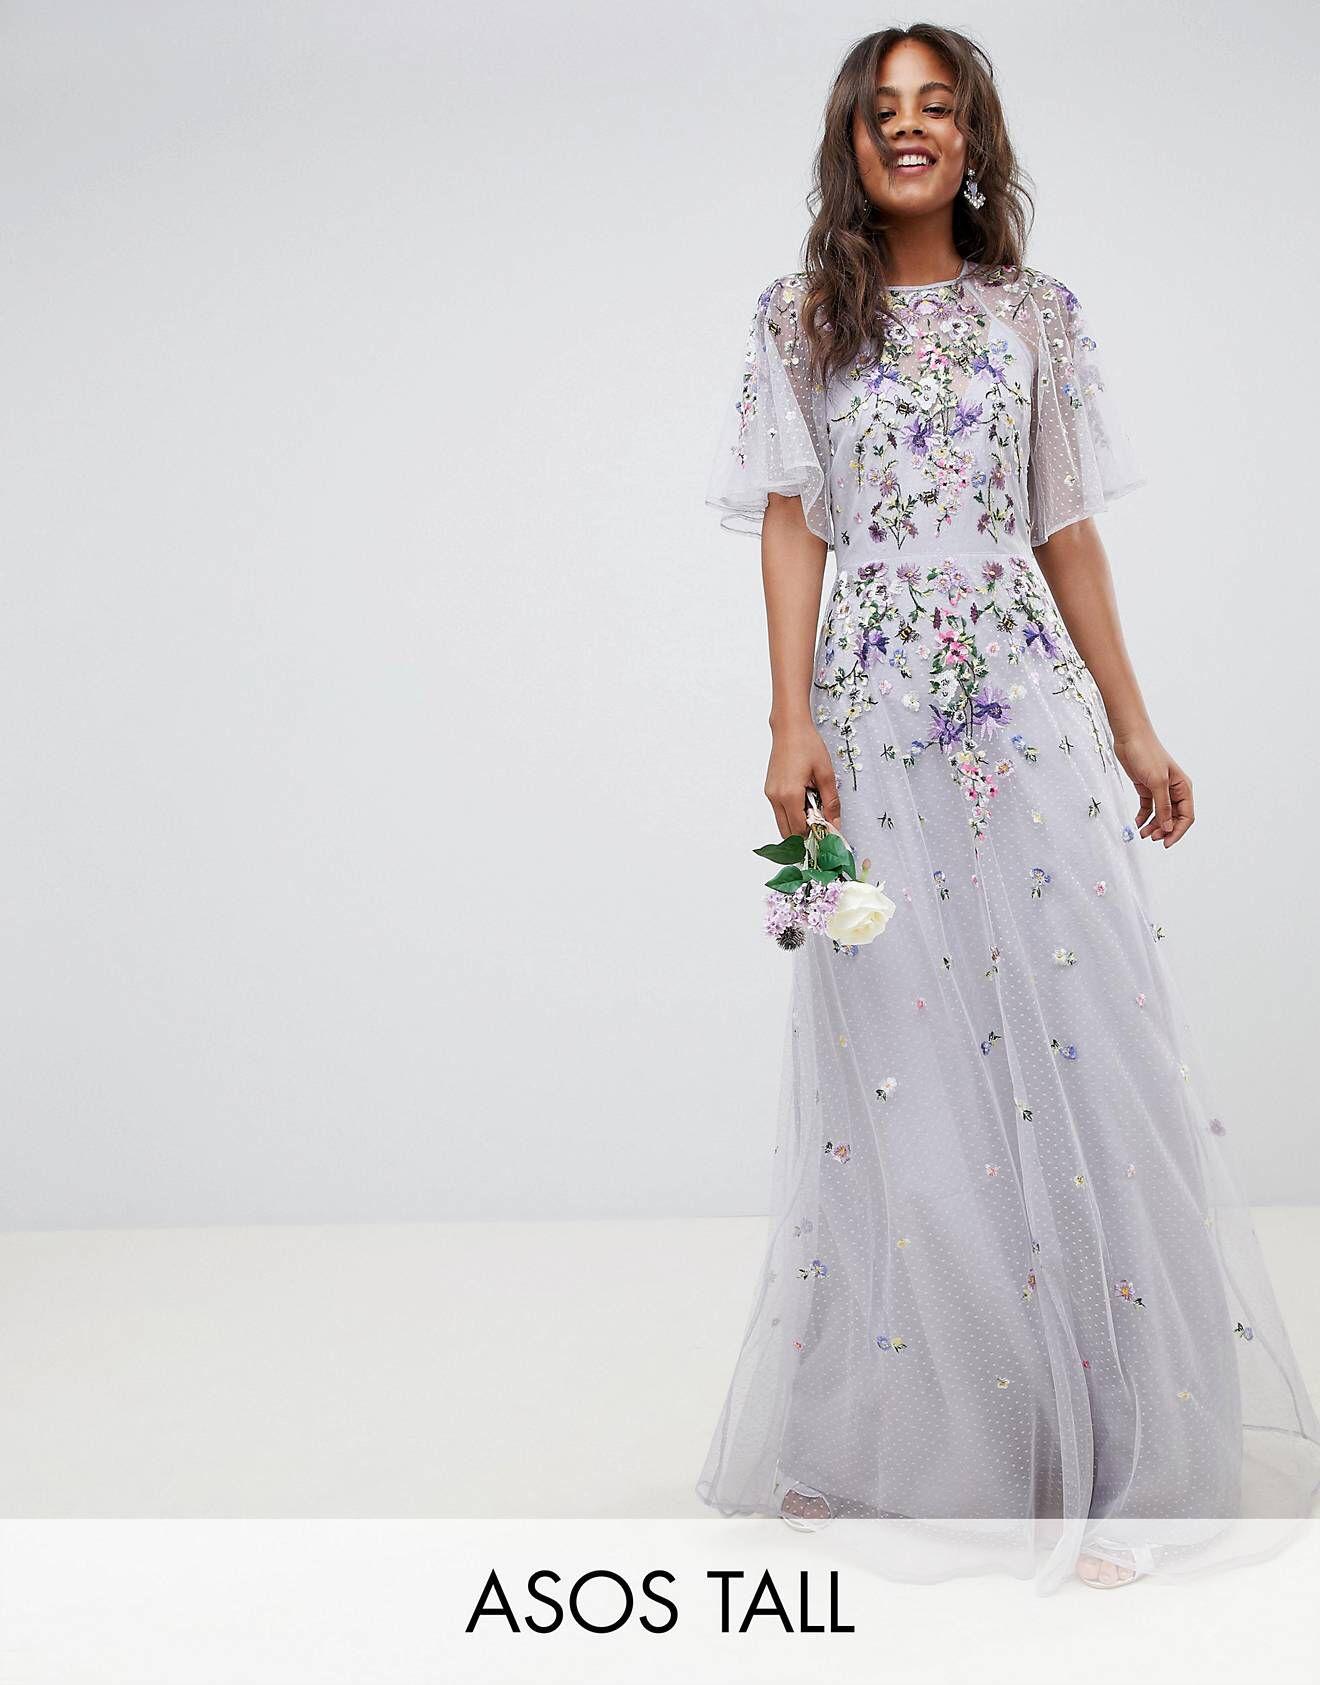 520a0493e0c Asos Tall Pleated Dobby And Lace Top Long Sleeve Maxi Dress | Saddha